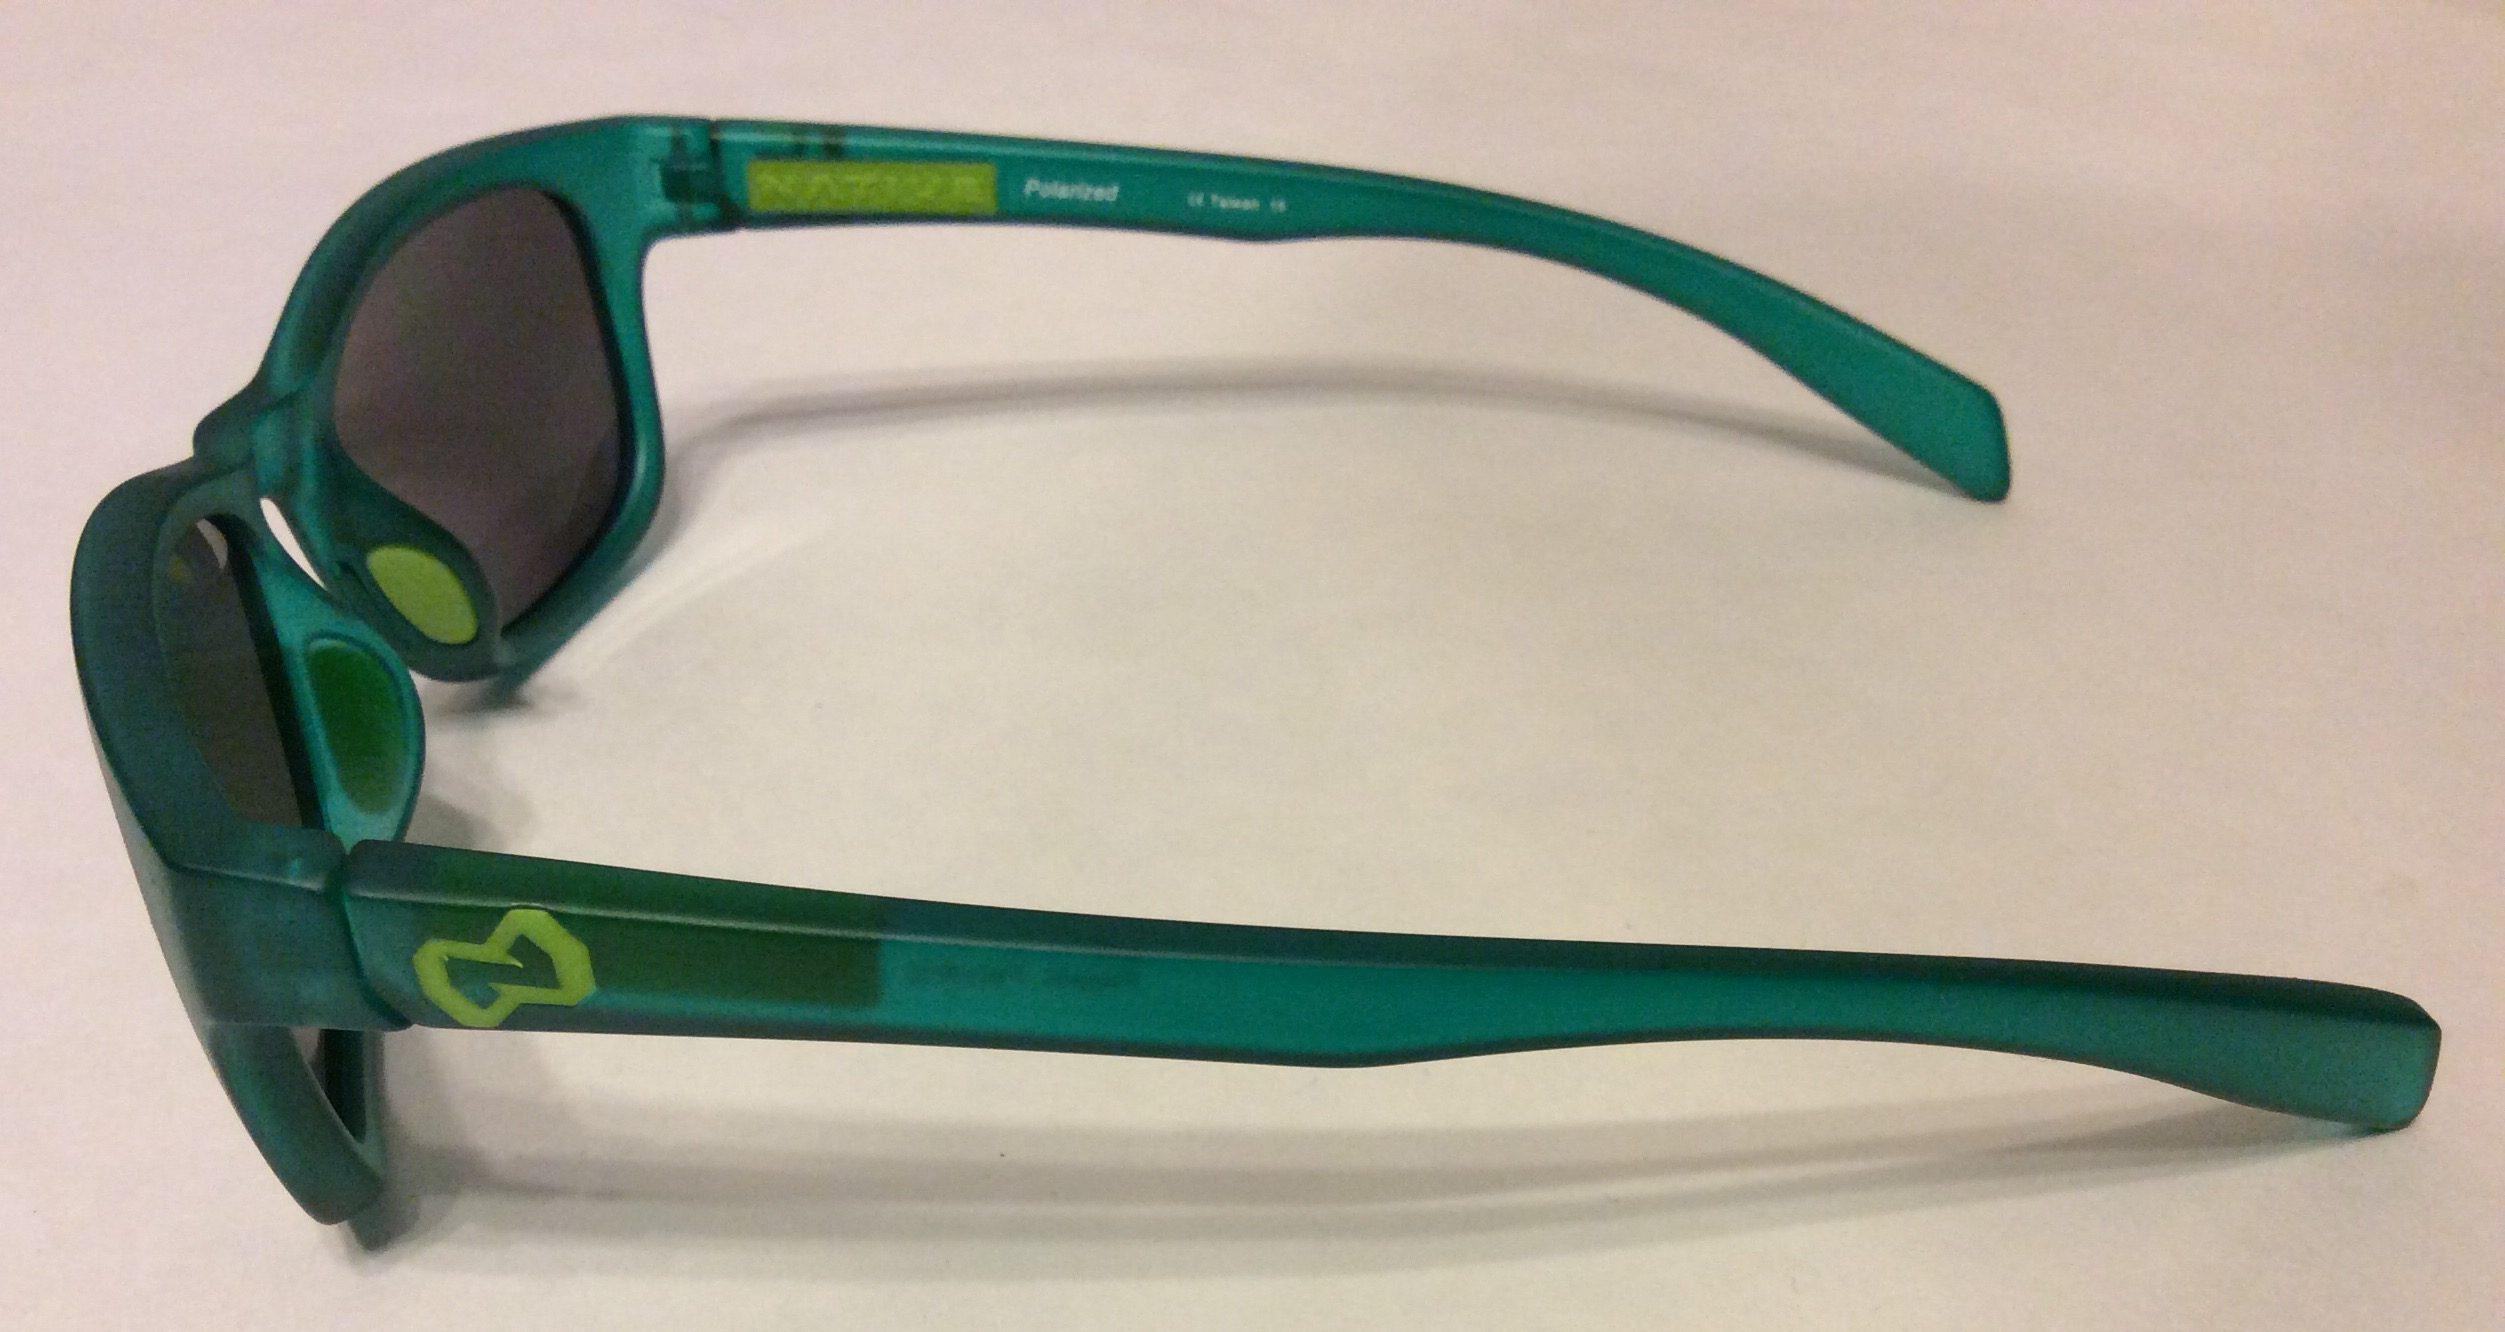 bbeef18fbc Native Eyewear Highline Sunglasses - Evergreen Frost POLARIZED N3 Gray